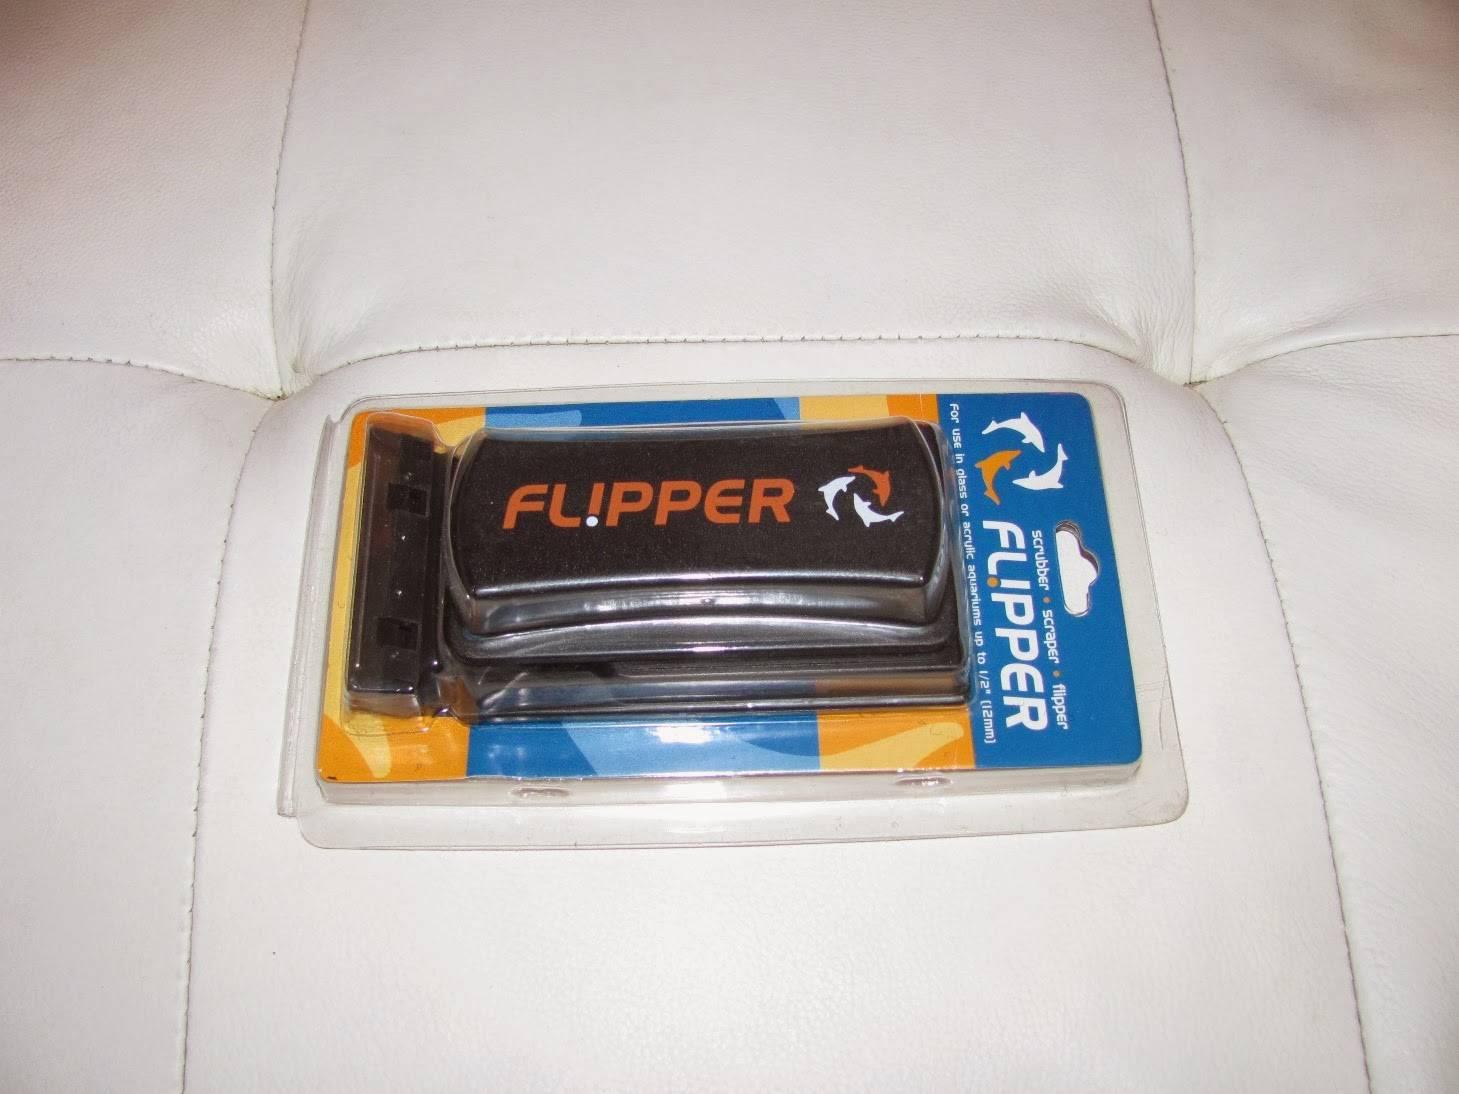 Flipper algae scraper in package